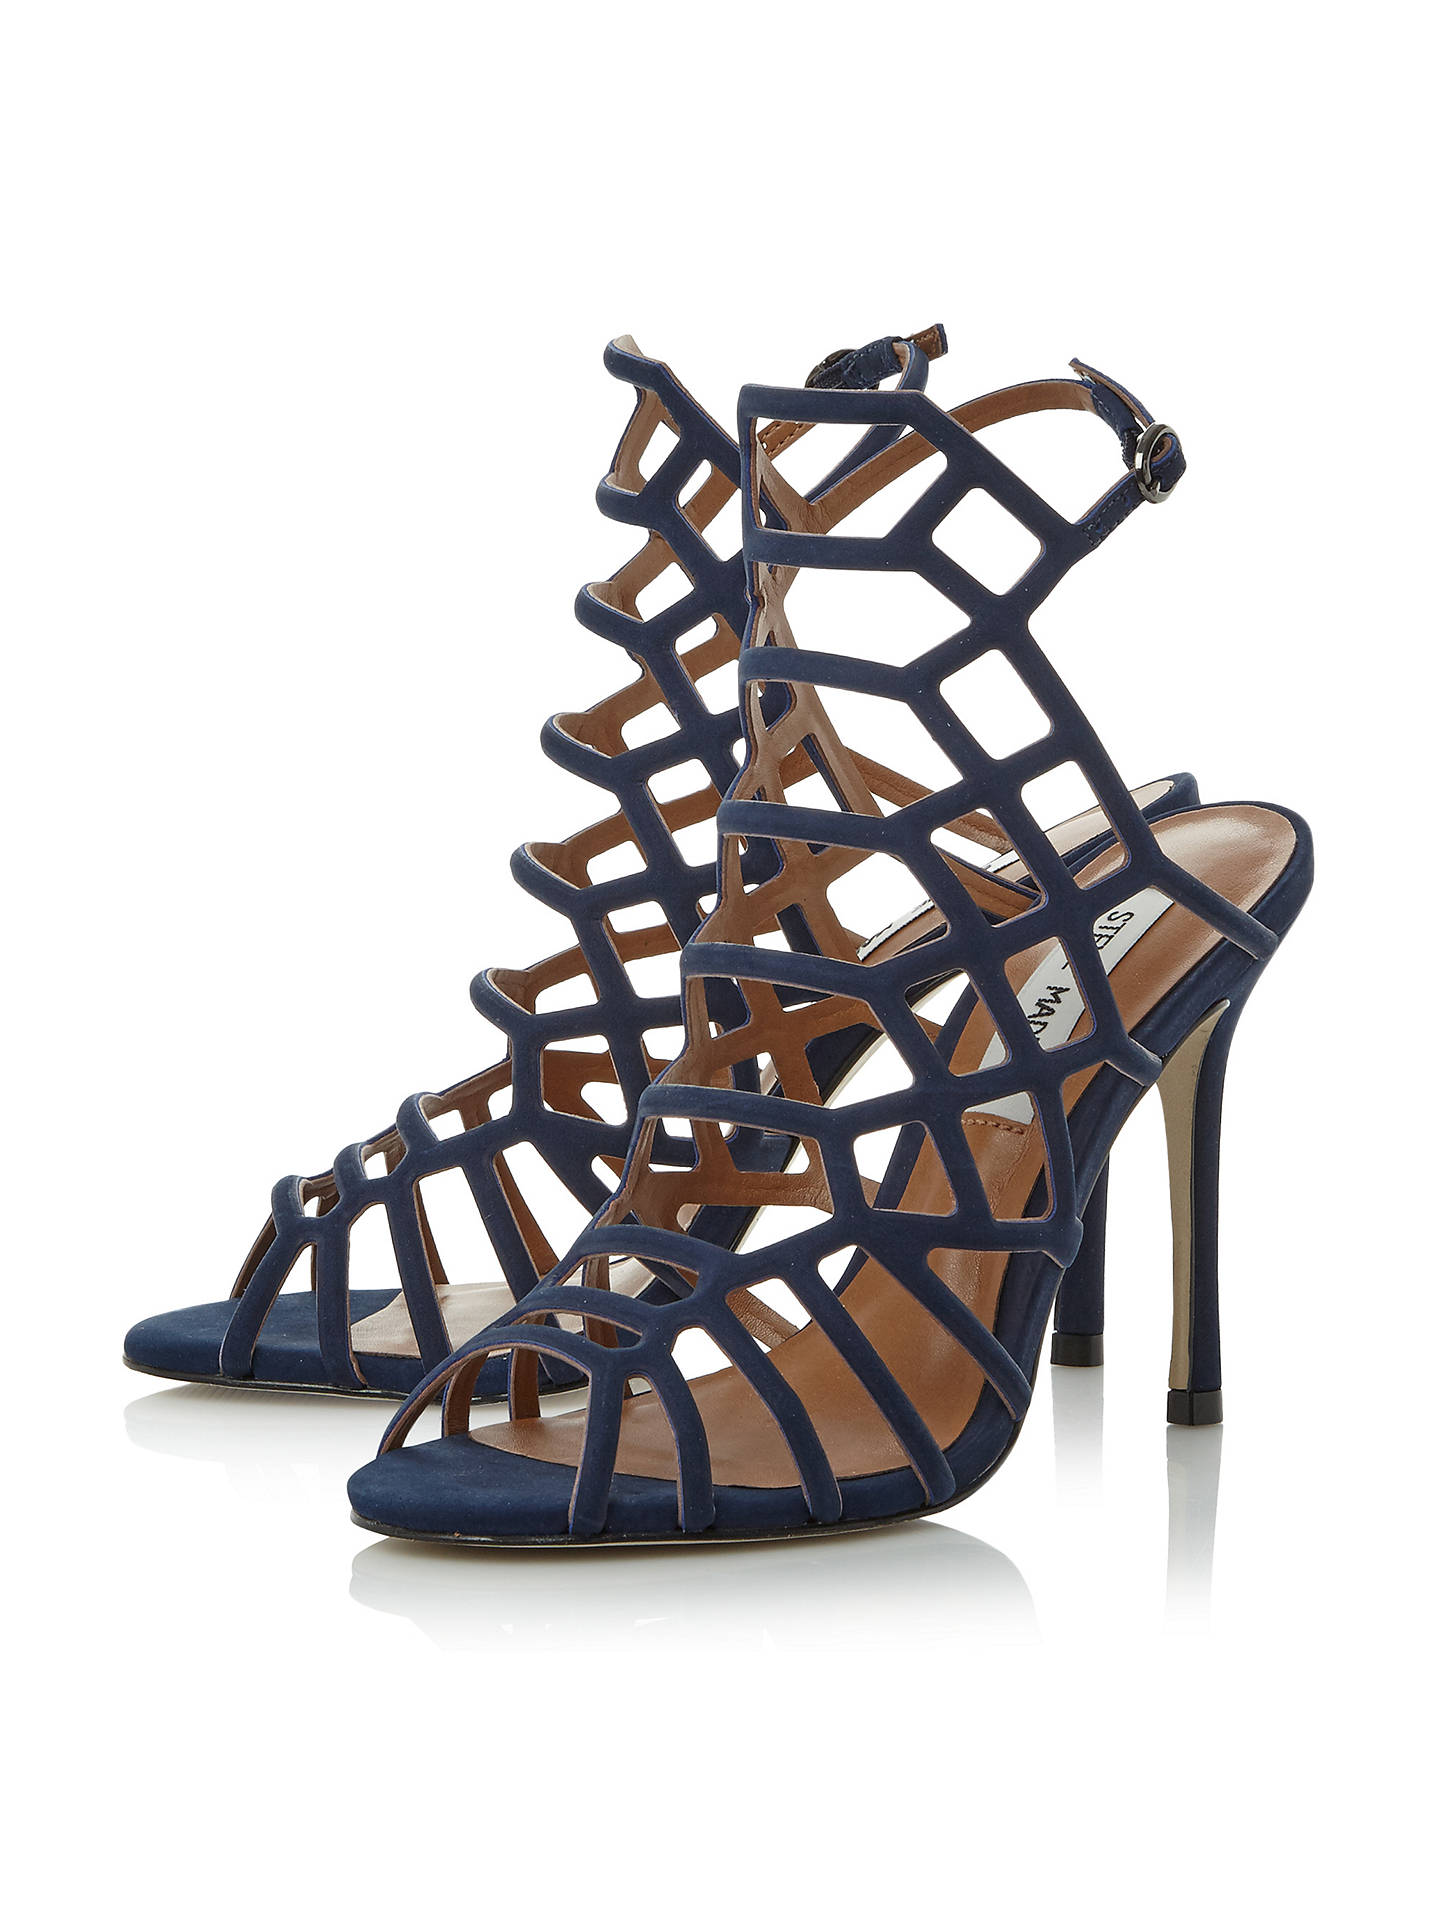 05701e5231d Buy Steve Madden Slithur High Heeled Cage Sandals